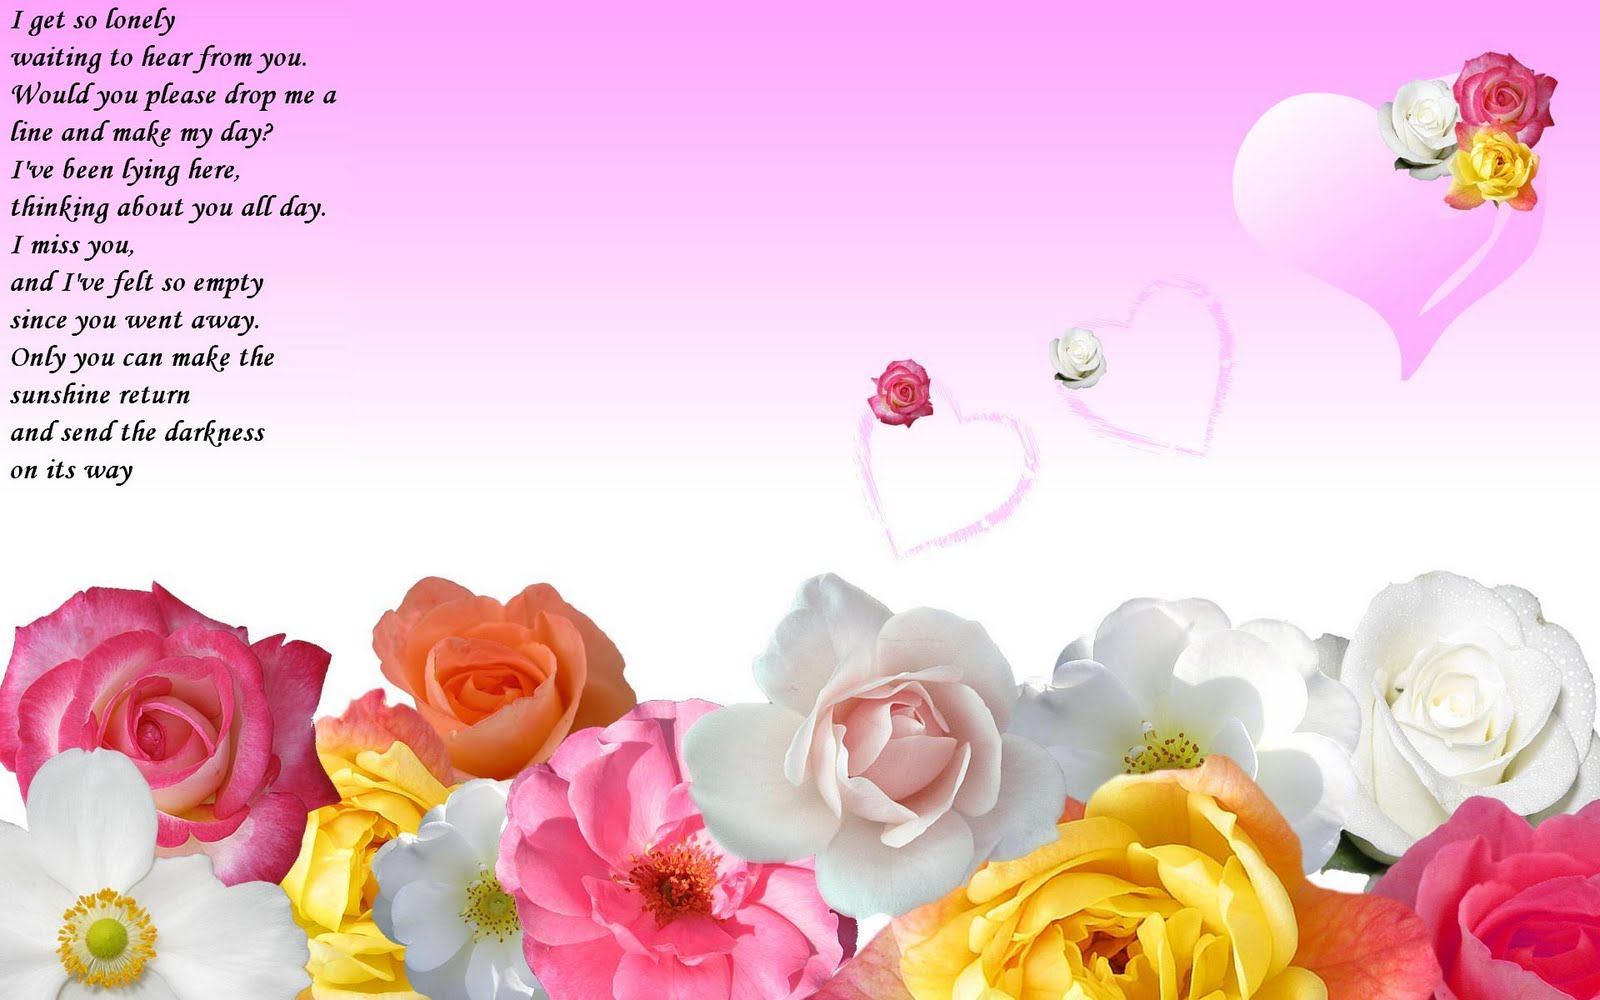 http://4.bp.blogspot.com/_tg42ArcfTzU/TGlPUHLMsPI/AAAAAAAABF8/PPeQmOIfWbs/s1600/Love+Gallery+free.jpg